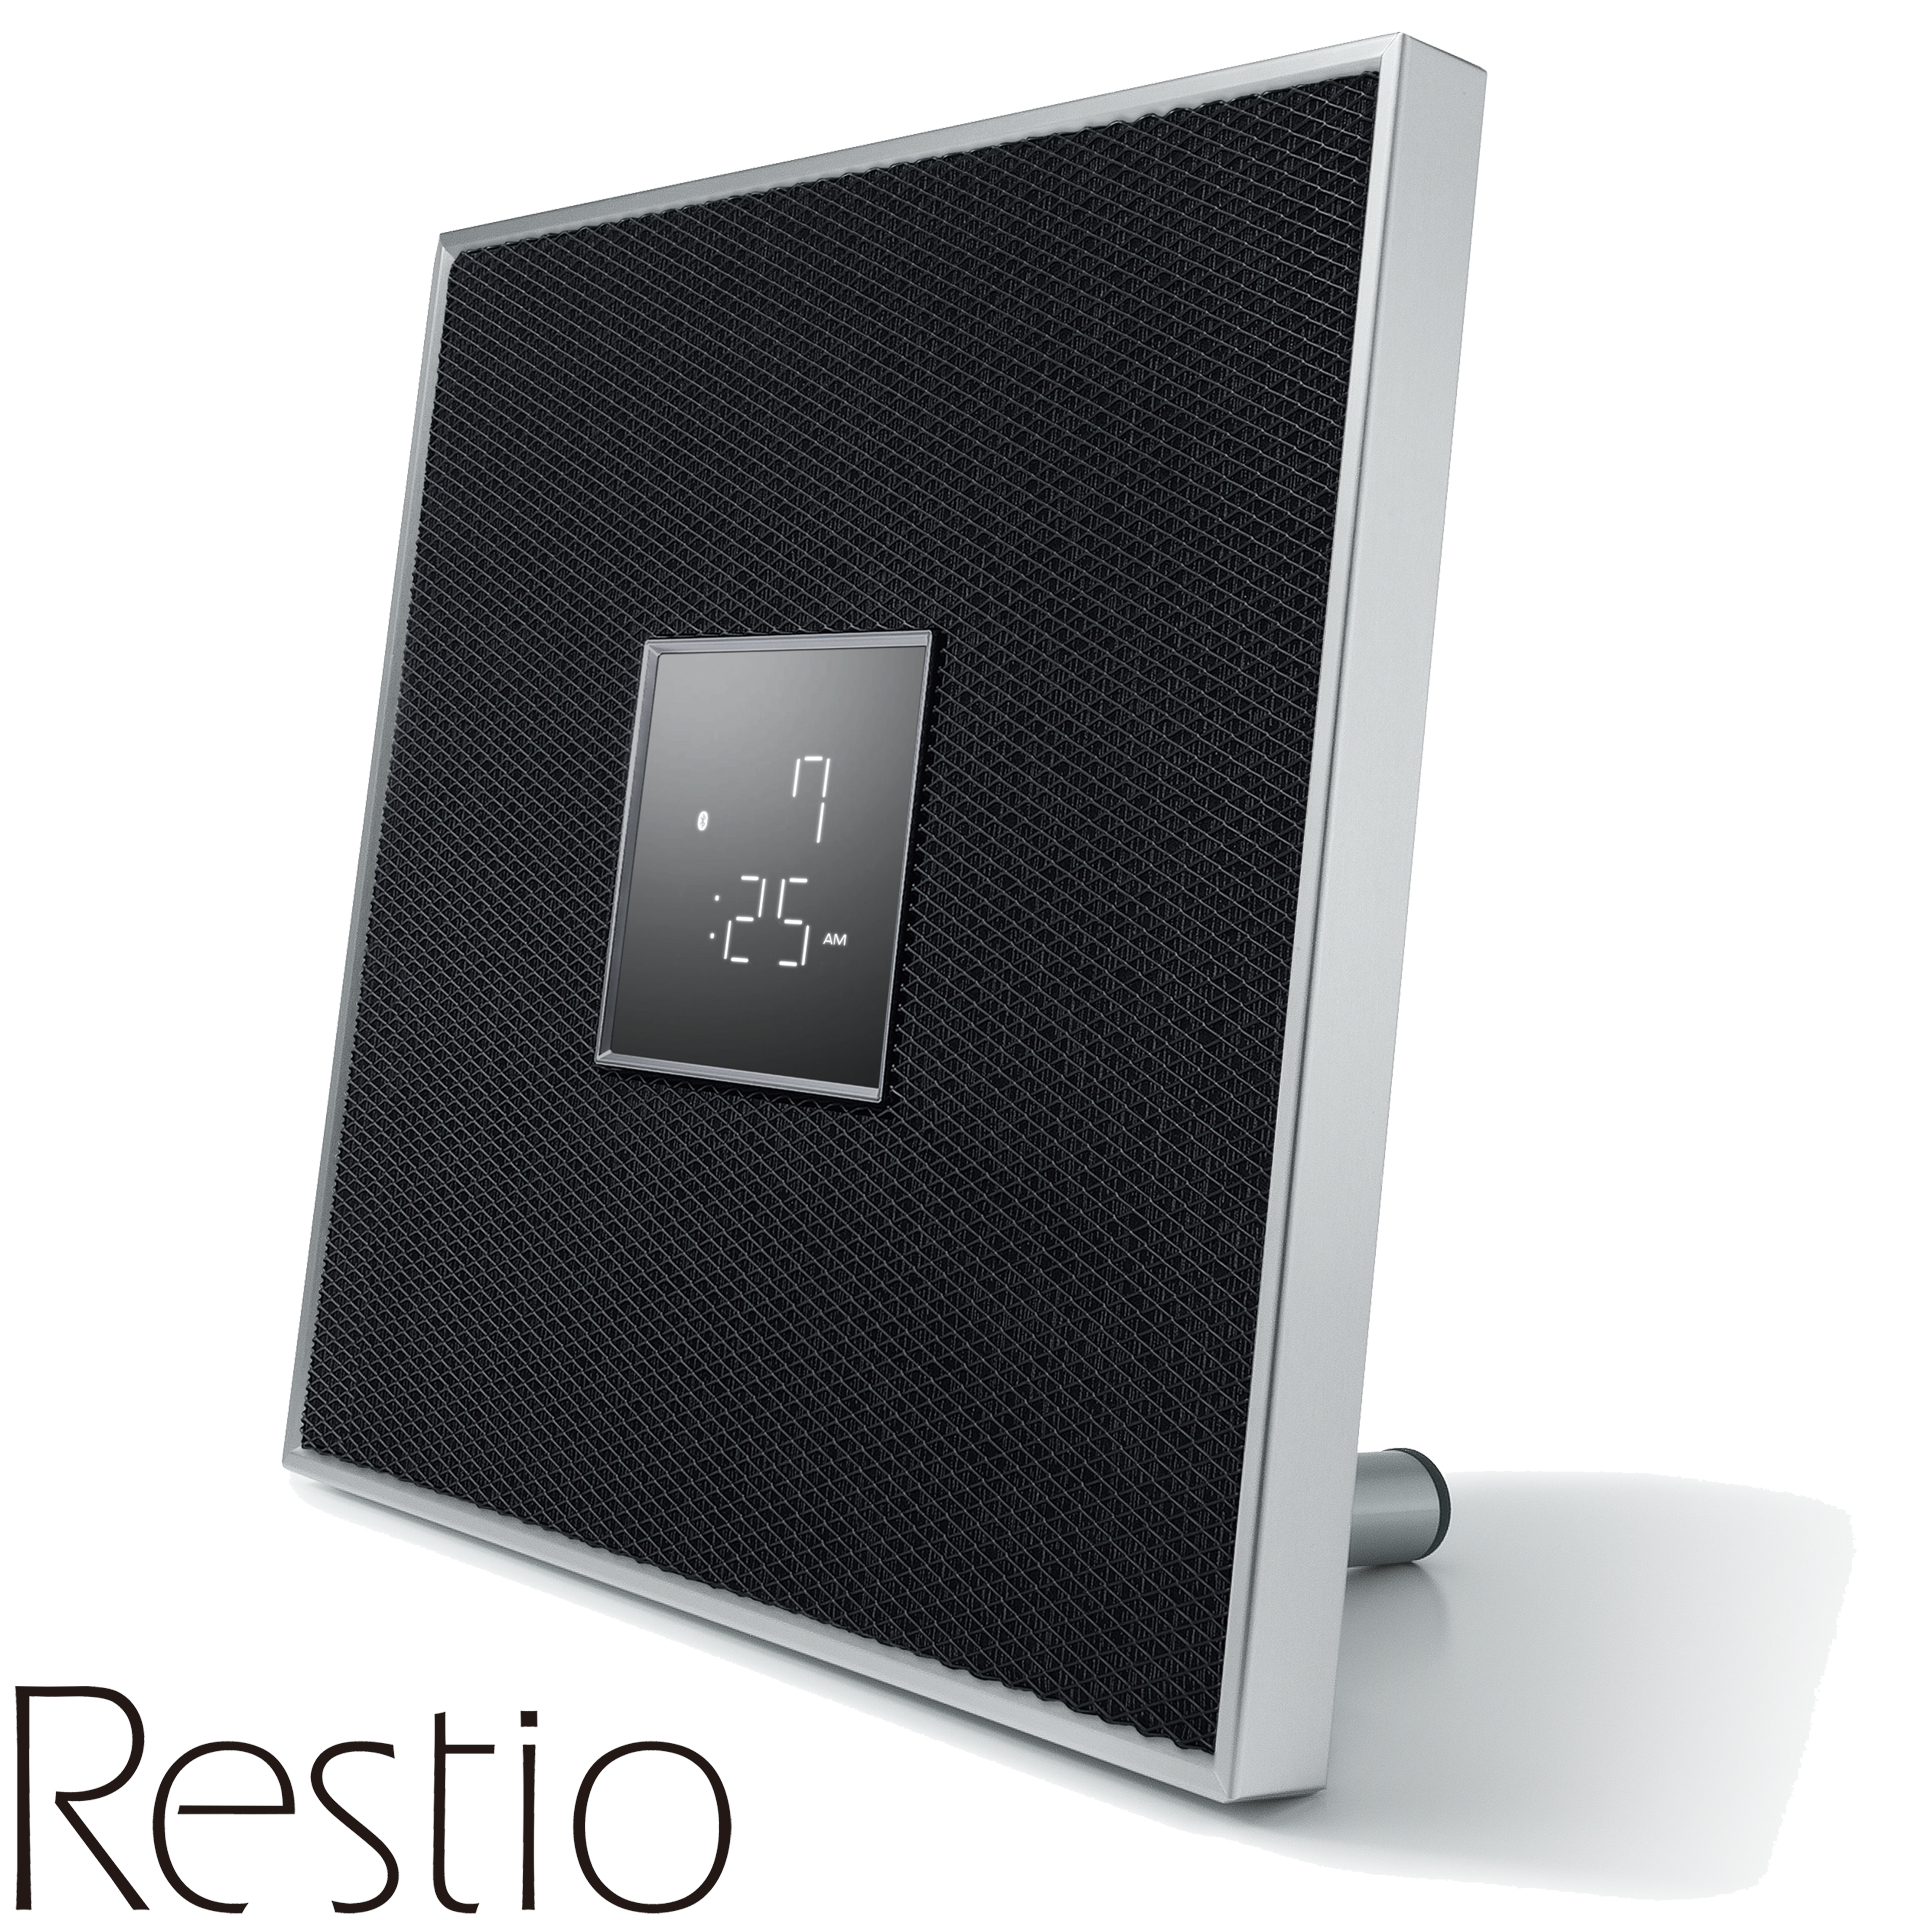 Restioシリーズ ISX-...